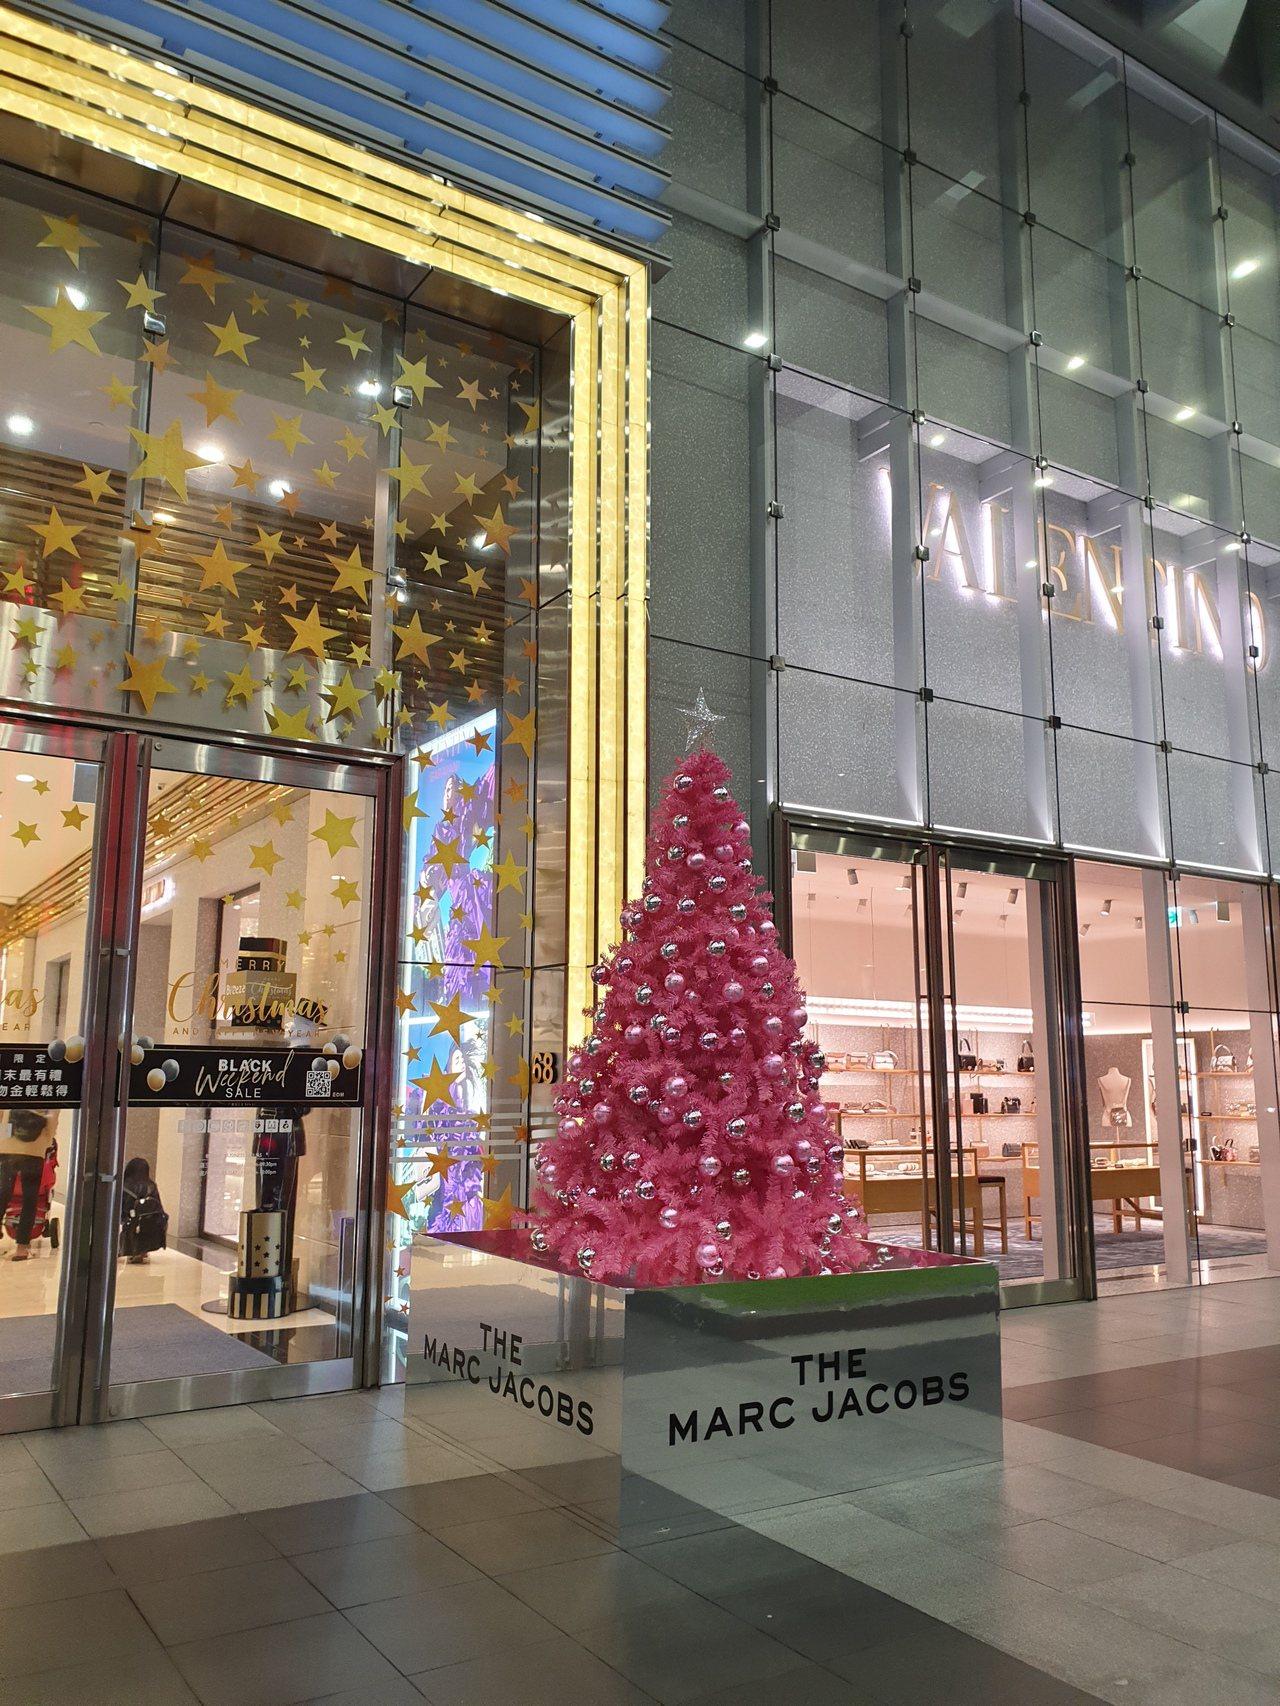 The Marc Jacobs耶誕樹即日起到12月31日期間限定在信義微風大門展...